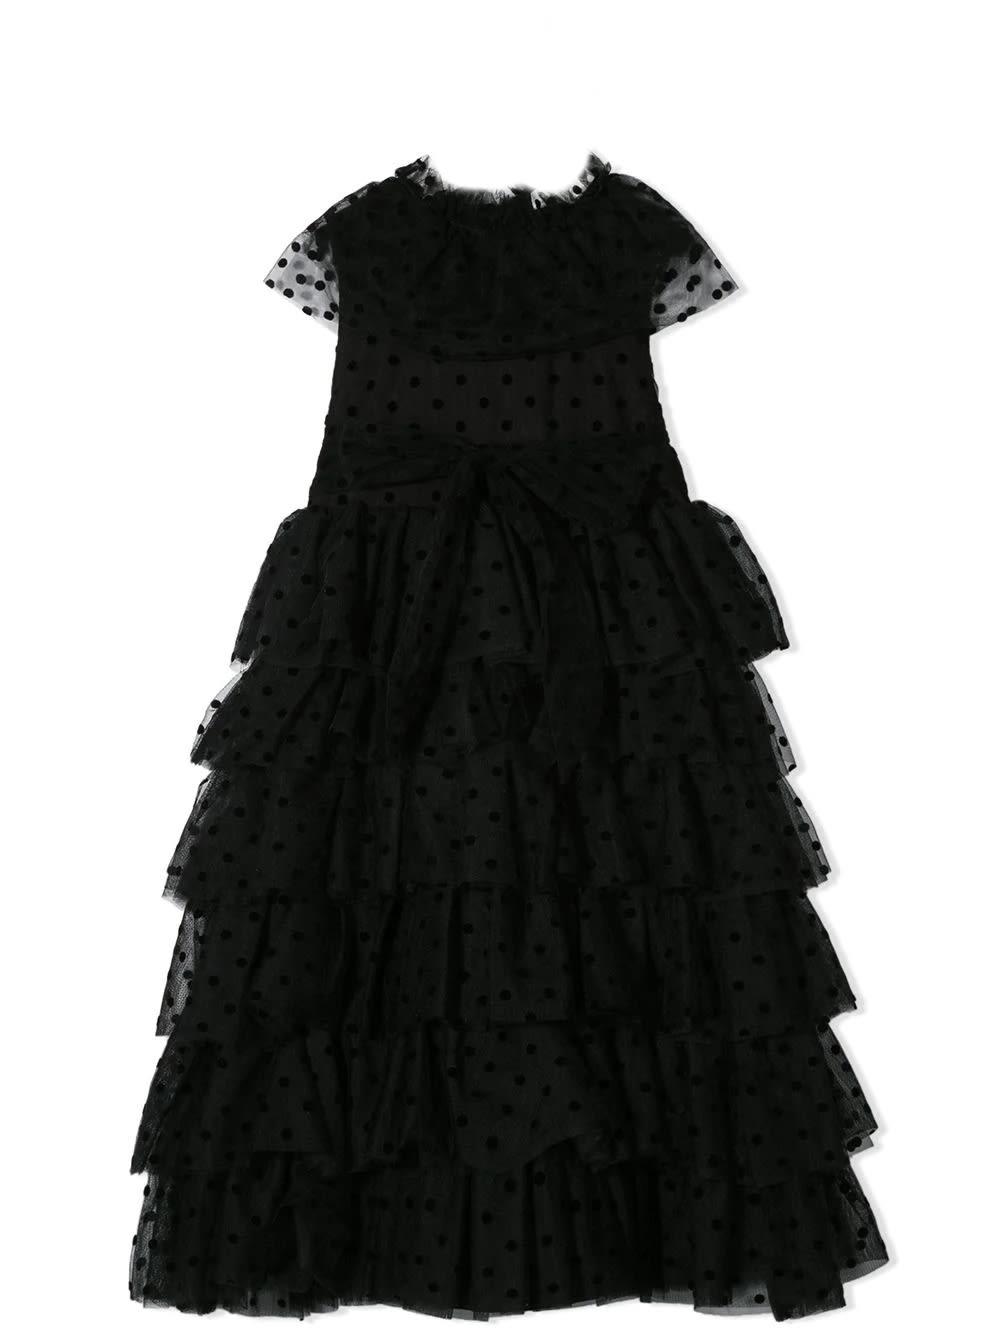 Buy Sonia by Sonia Rykiel Polka Dot Tulle Dress online, shop Sonia by Sonia Rykiel with free shipping